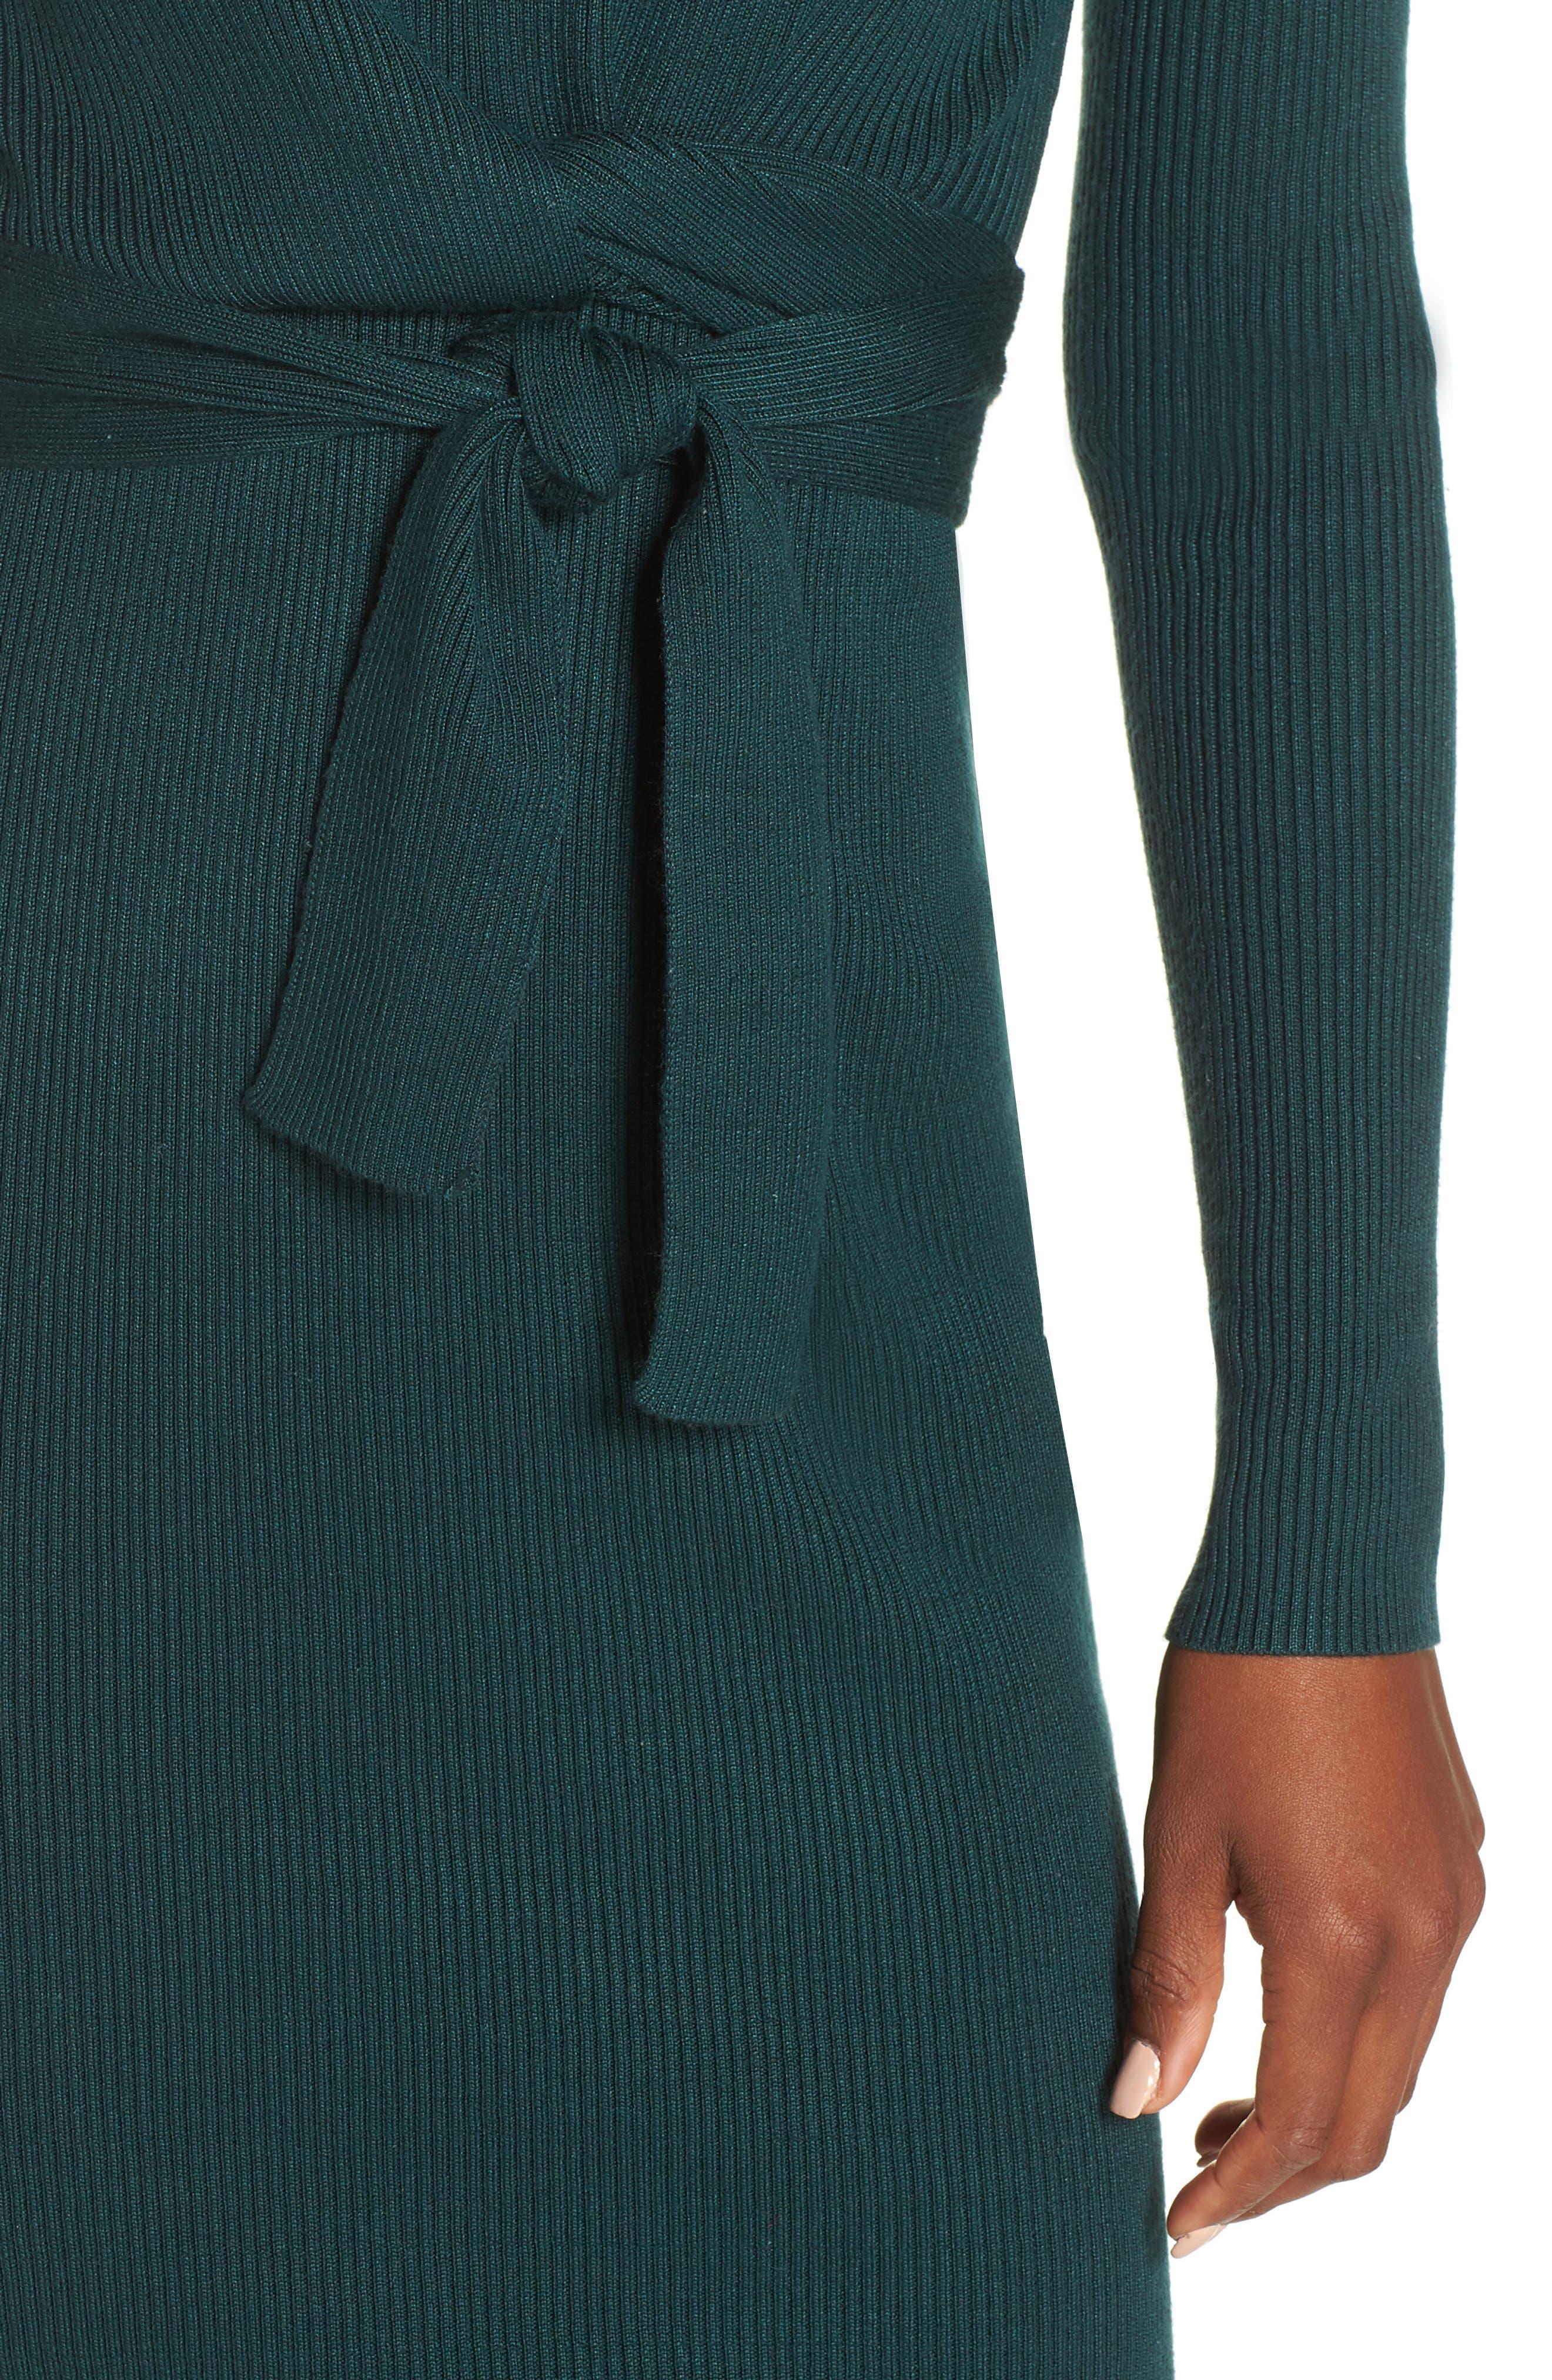 Dovie Sweater Dress,                             Alternate thumbnail 4, color,                             307